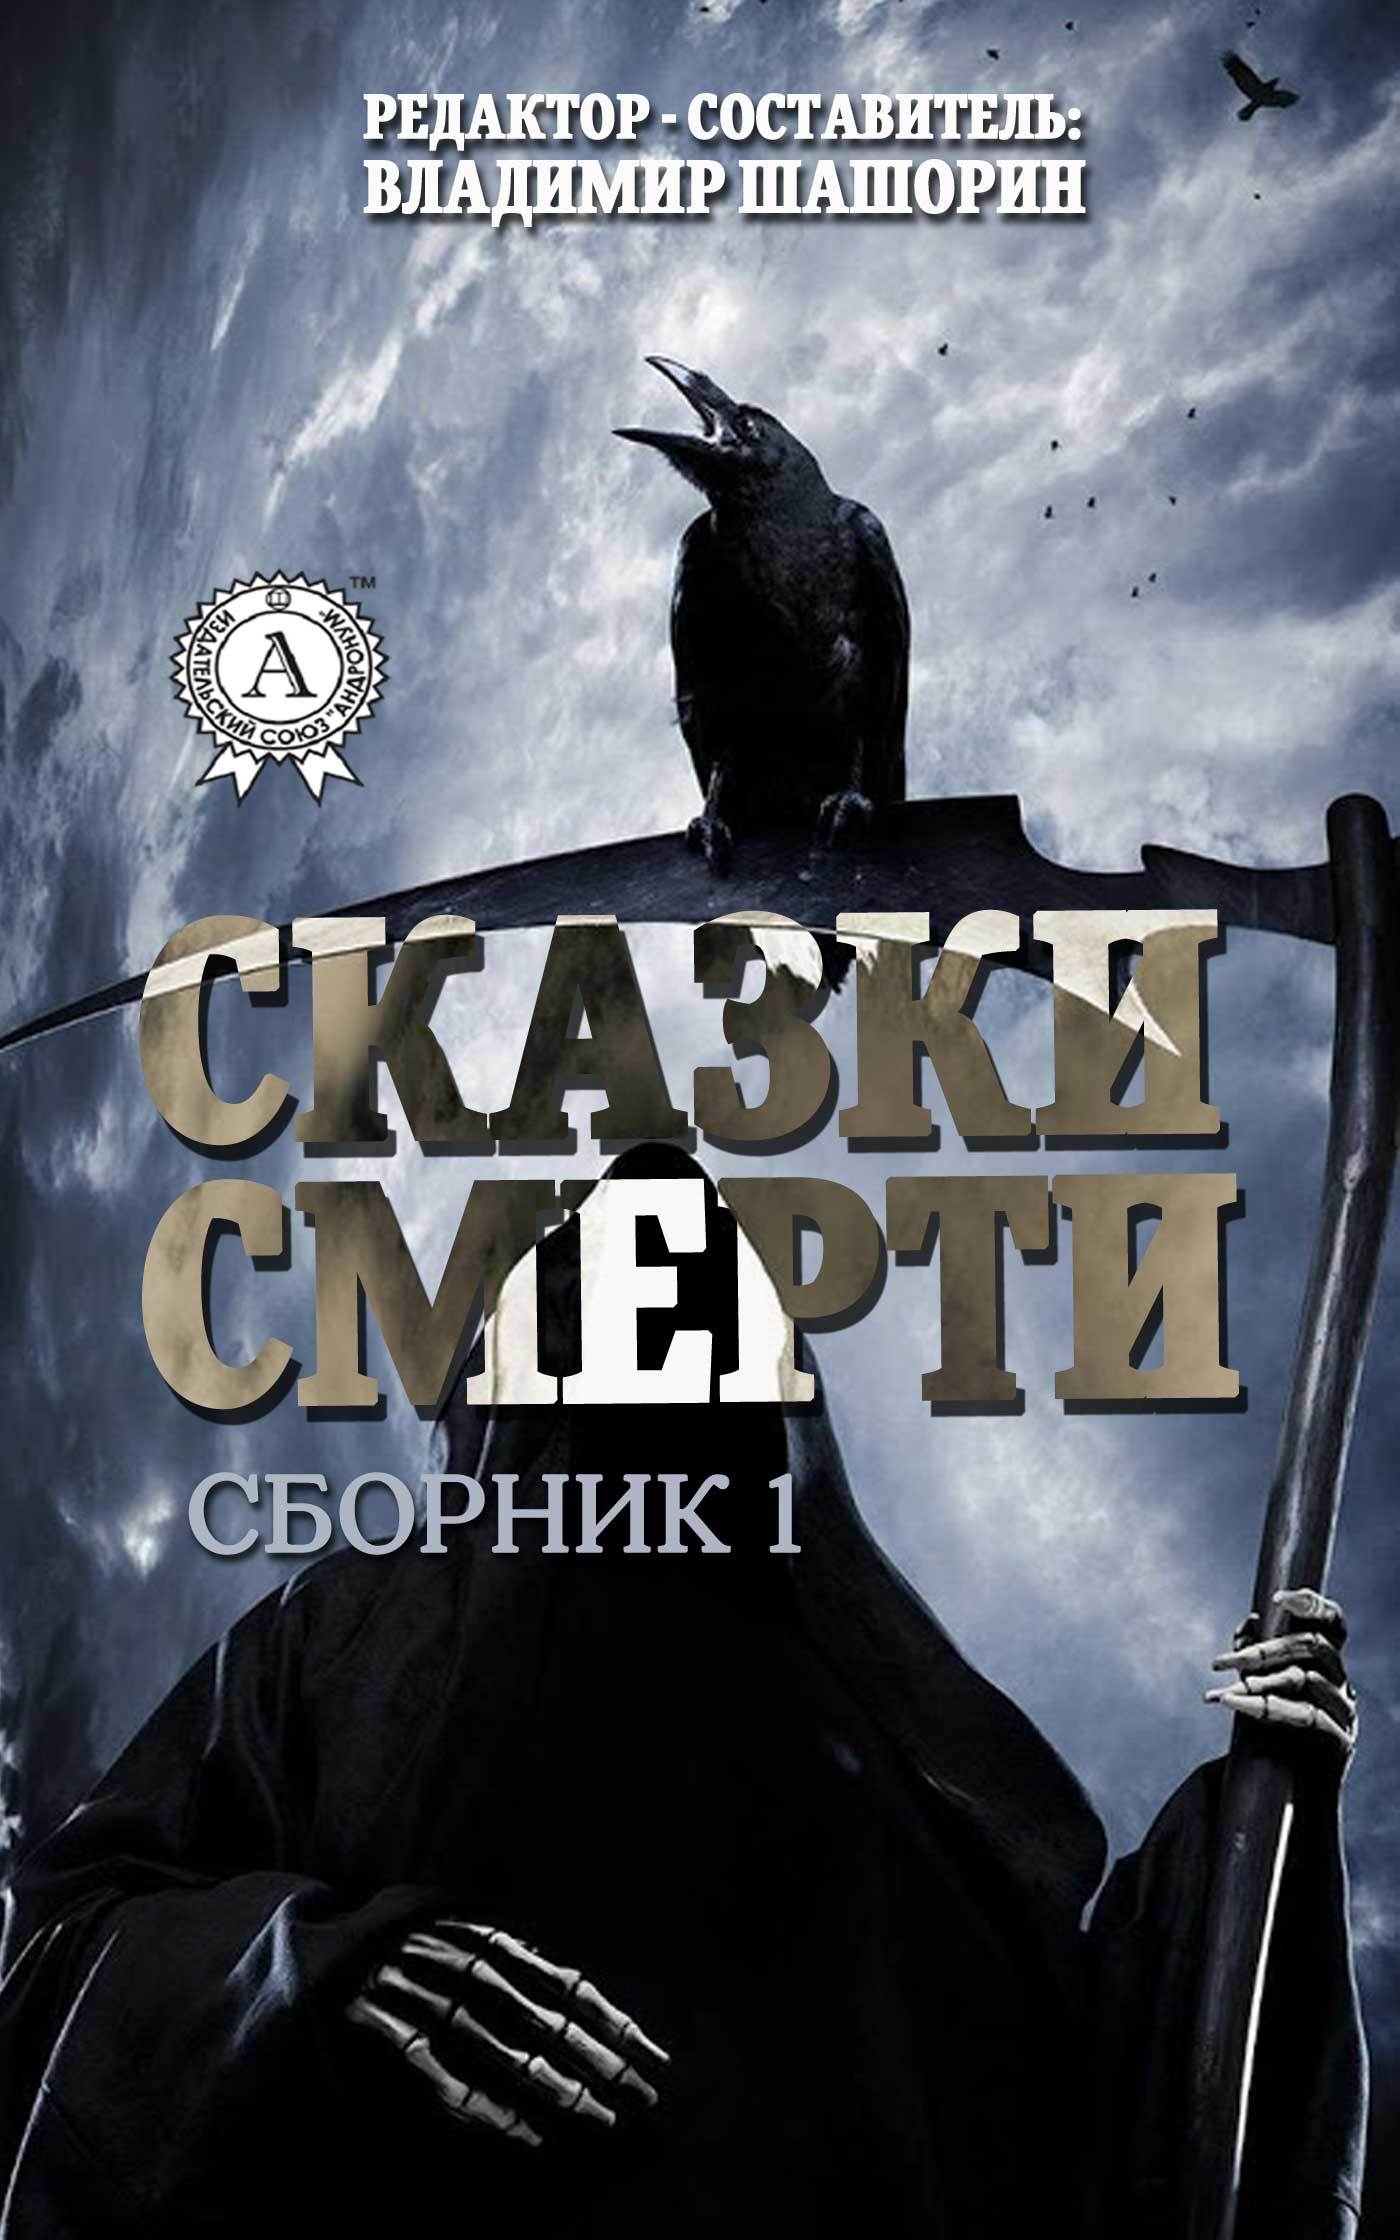 Владимир Шашорин - Сказки Смерти (Сборник 1)